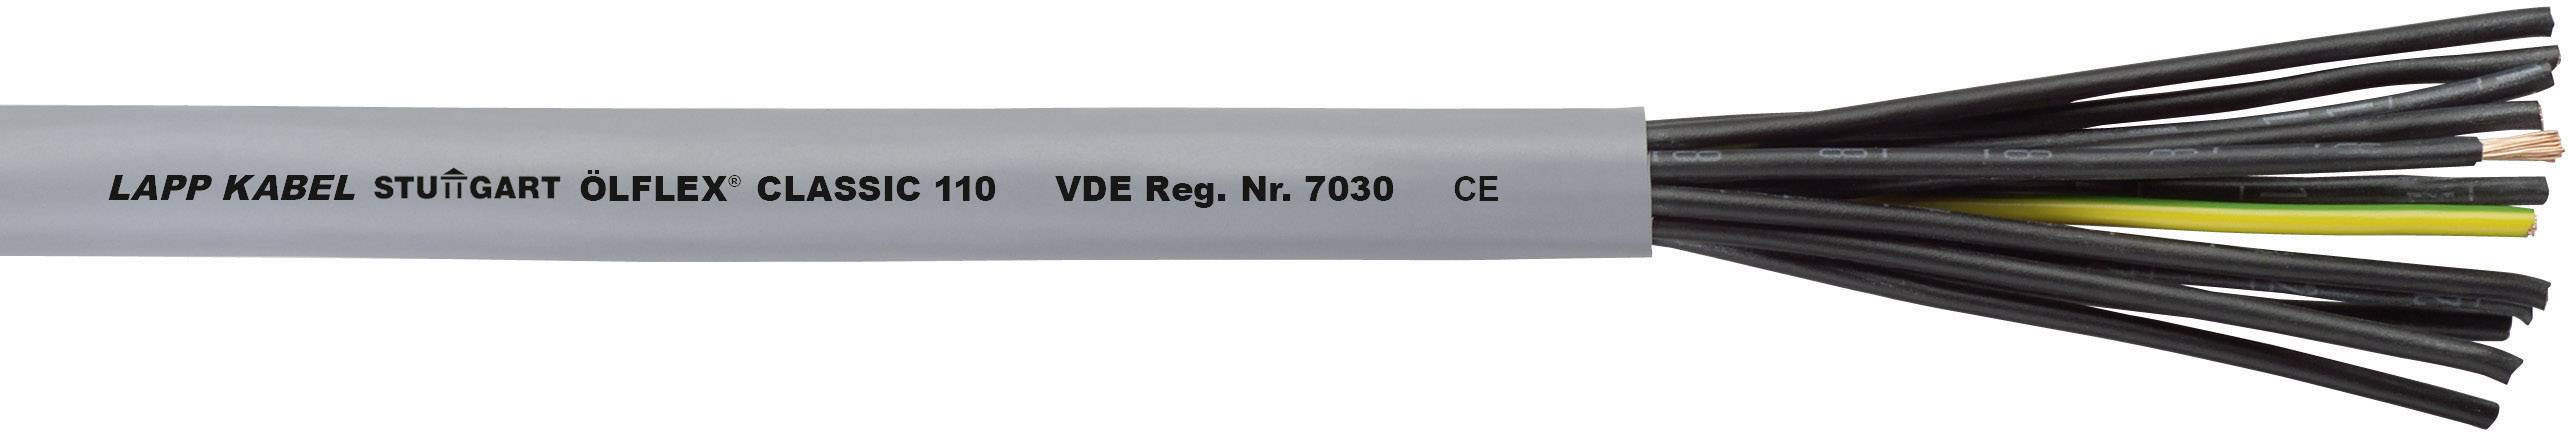 Datový kabel LappKabel Ölflex CLASSIC 110, 5 x 0,5 mm², šedá, 1 m